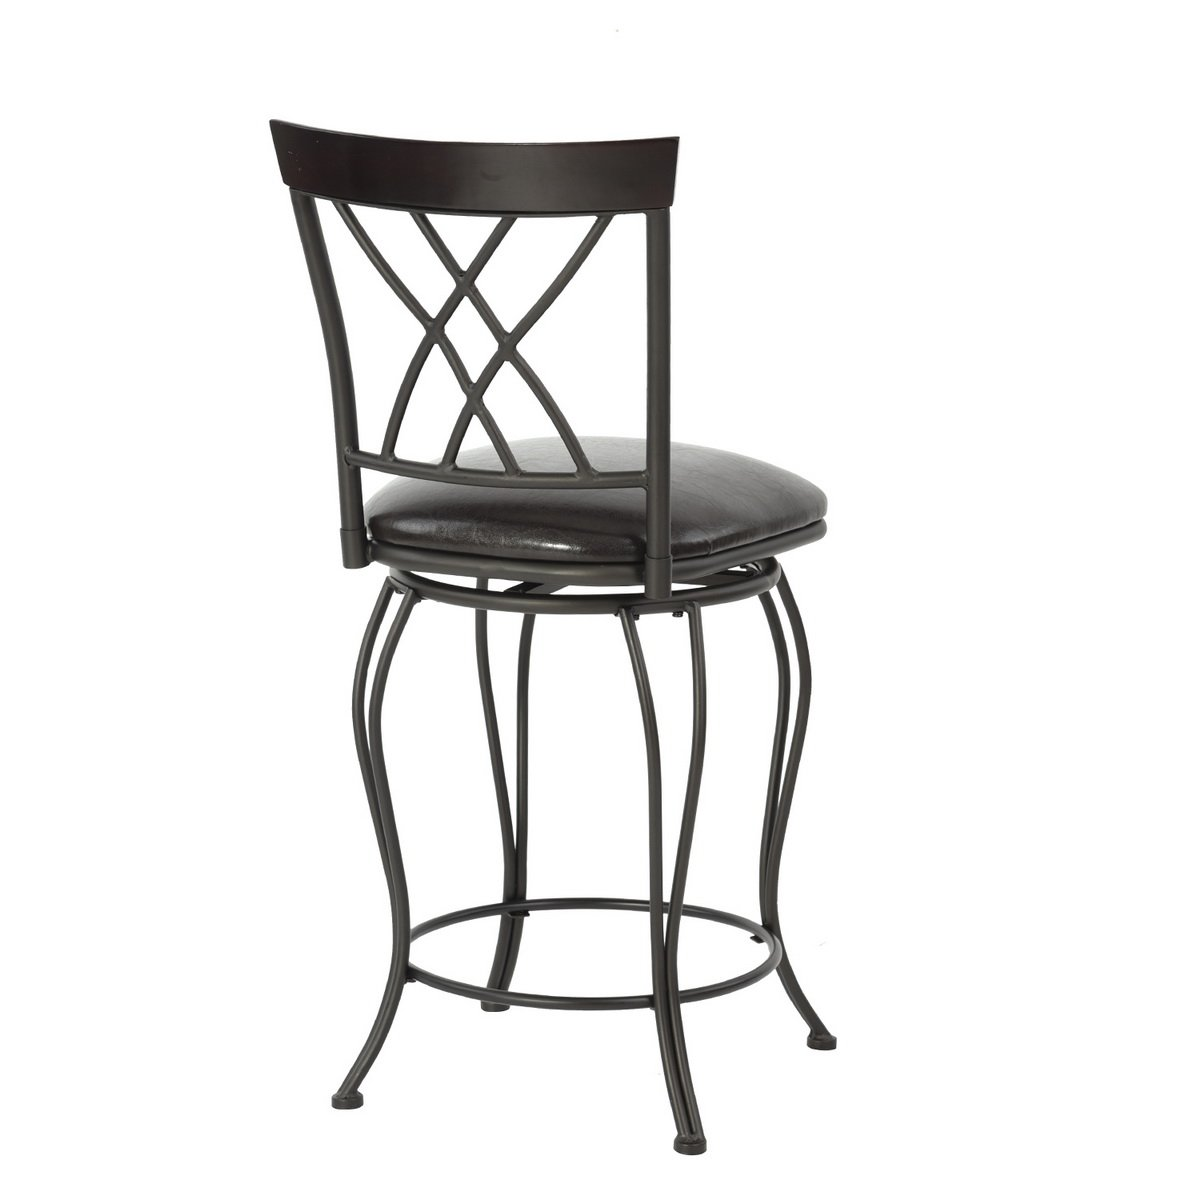 FurnitureR 24'' Circles-Back Swivel Bar stool Counter Height Bar Chair by FurnitureR (Image #5)